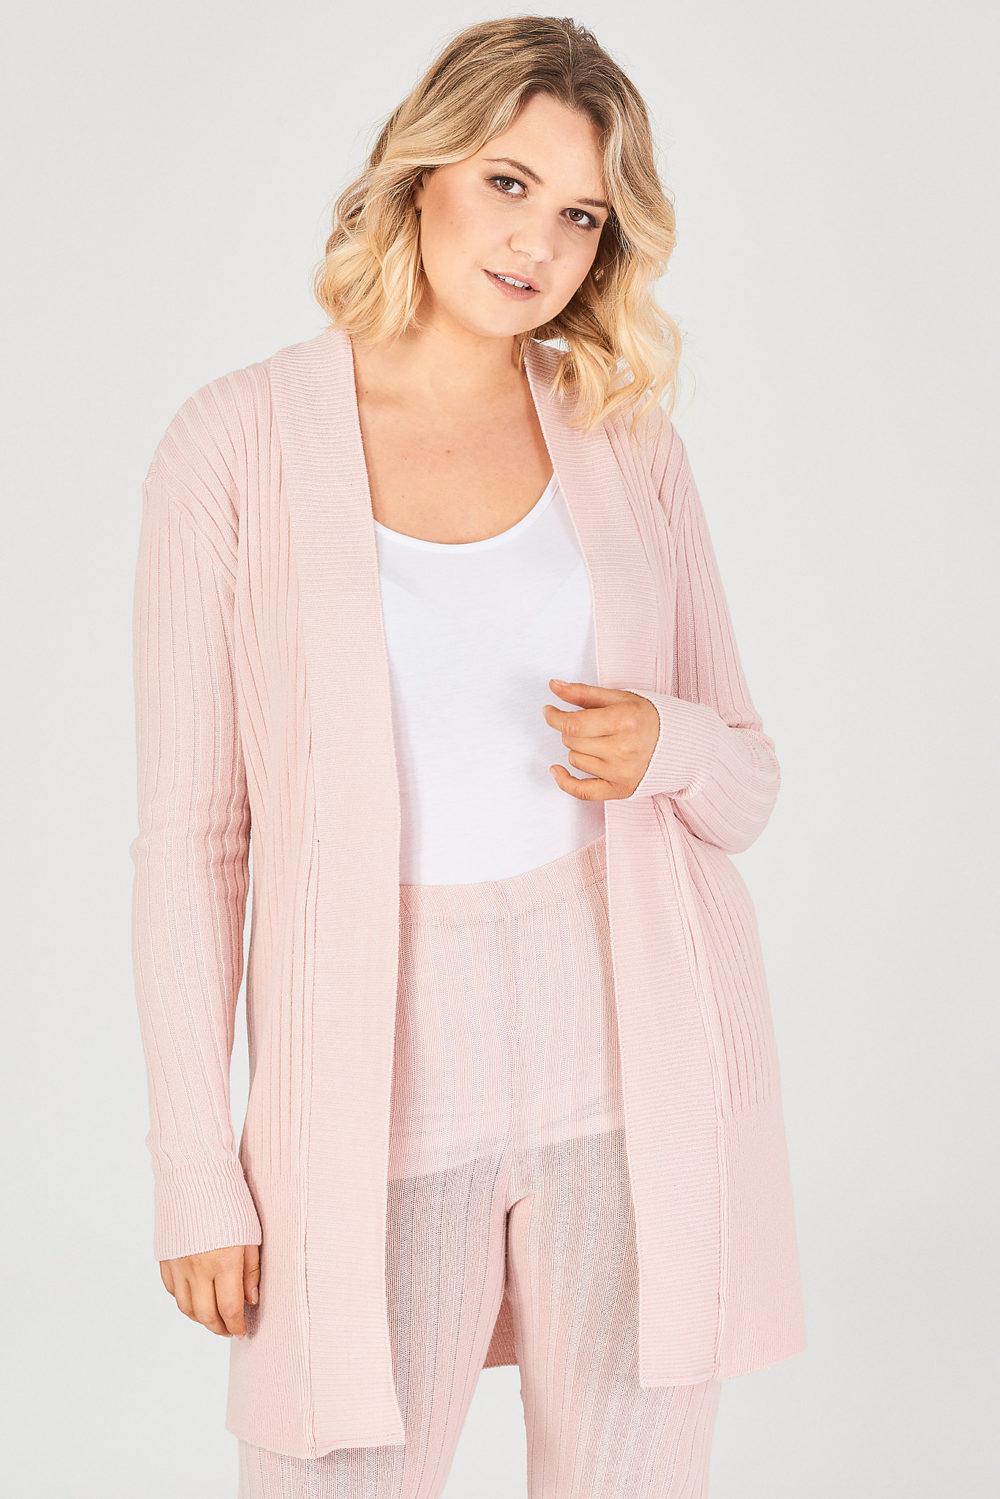 fashionbook wholesale plus size clothing knitted cardigan